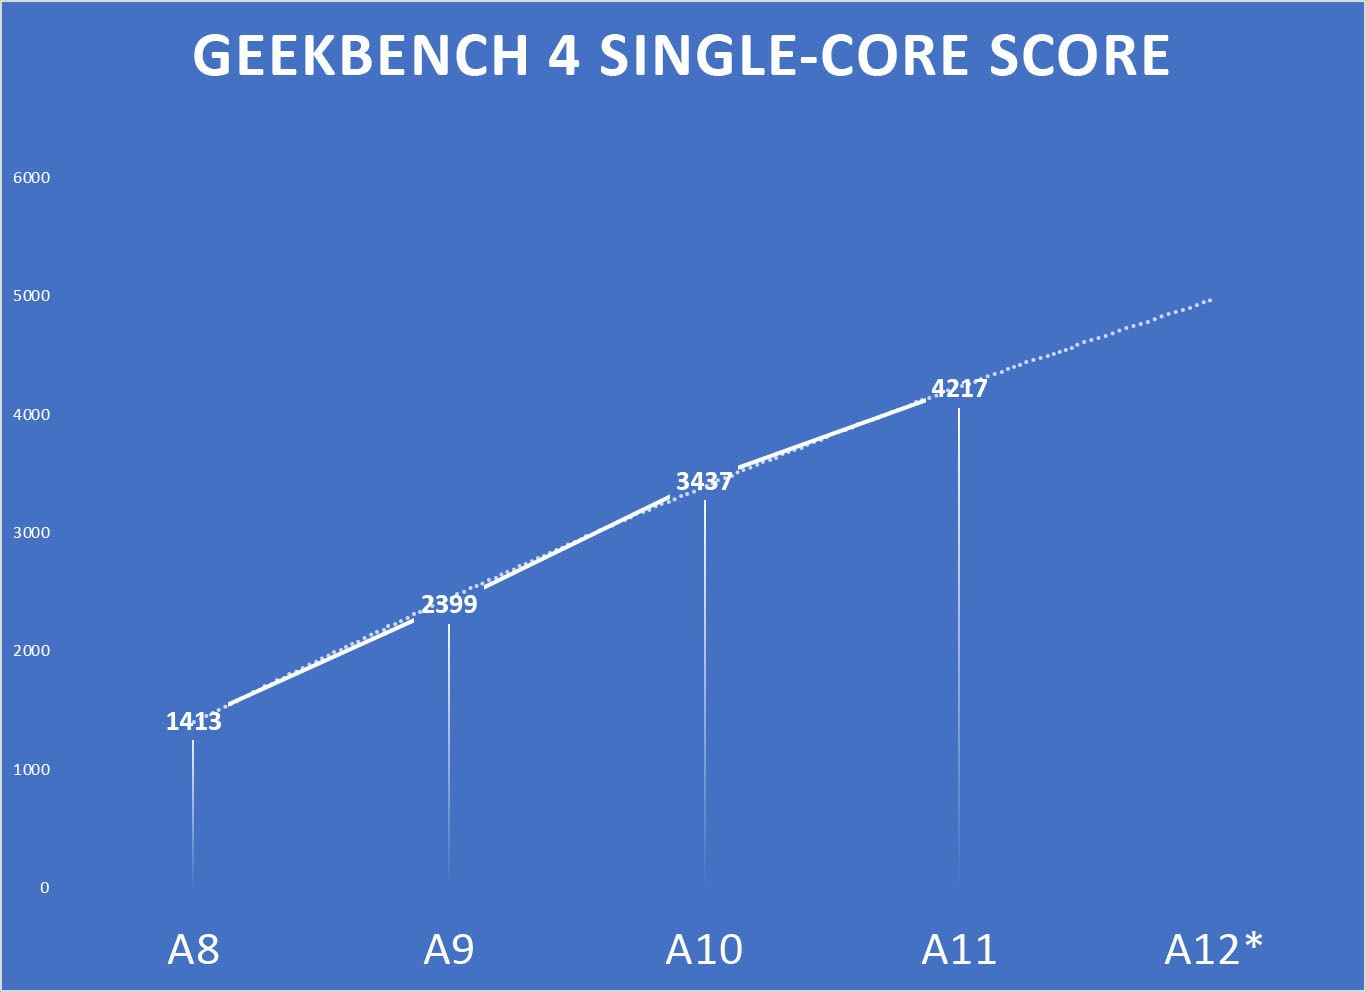 Resultados do Geekbech 4 dos últimos iPhones